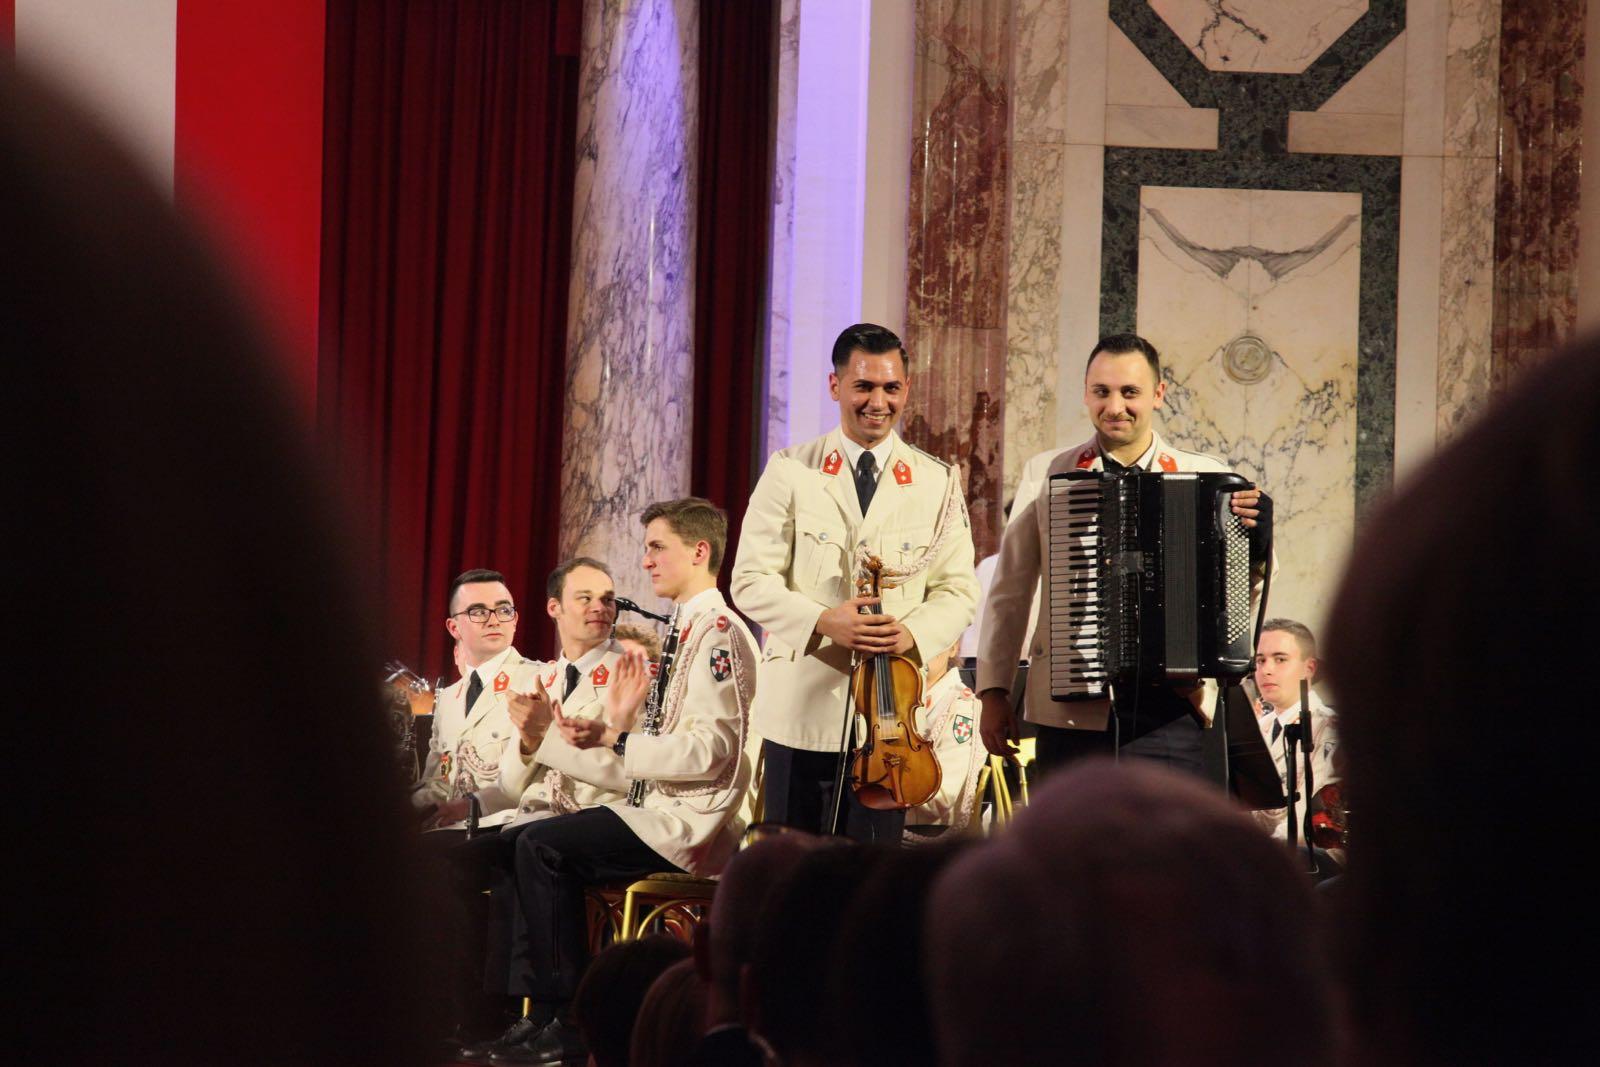 2019_03_14Gardemusik_Frühjahrskonzert_HBP_Hofburg - 104 of 177